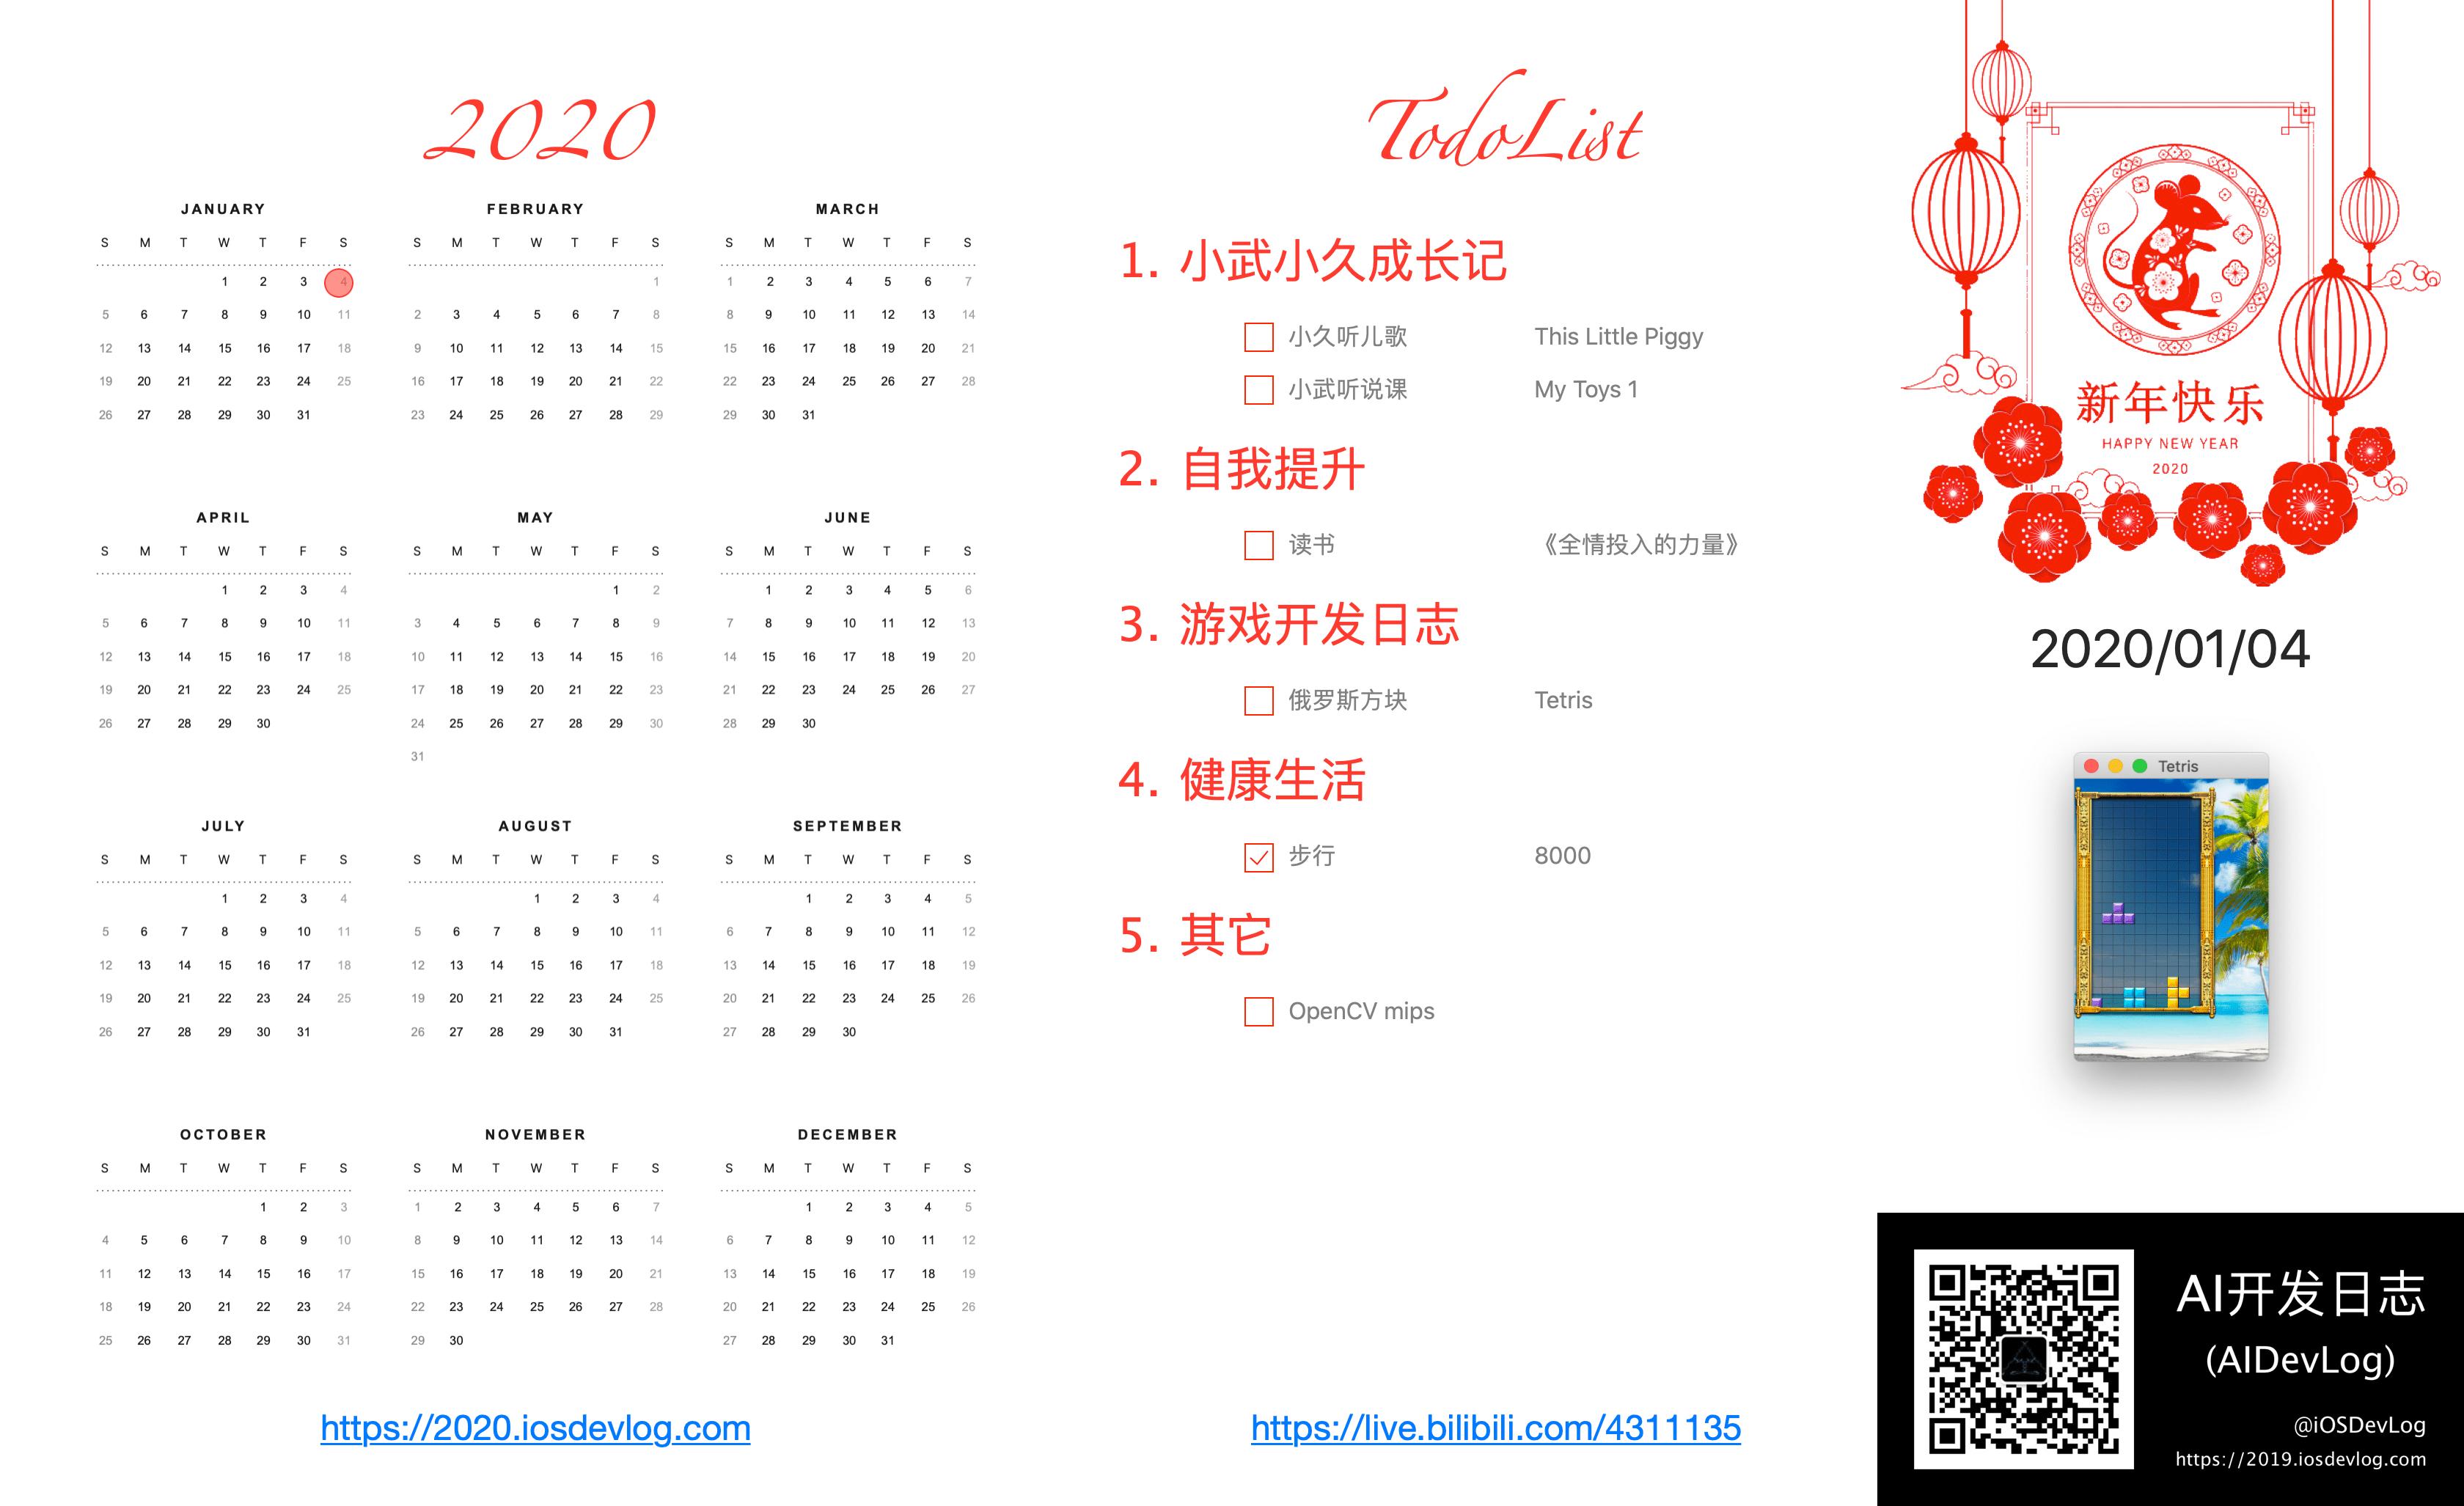 2020/01/04